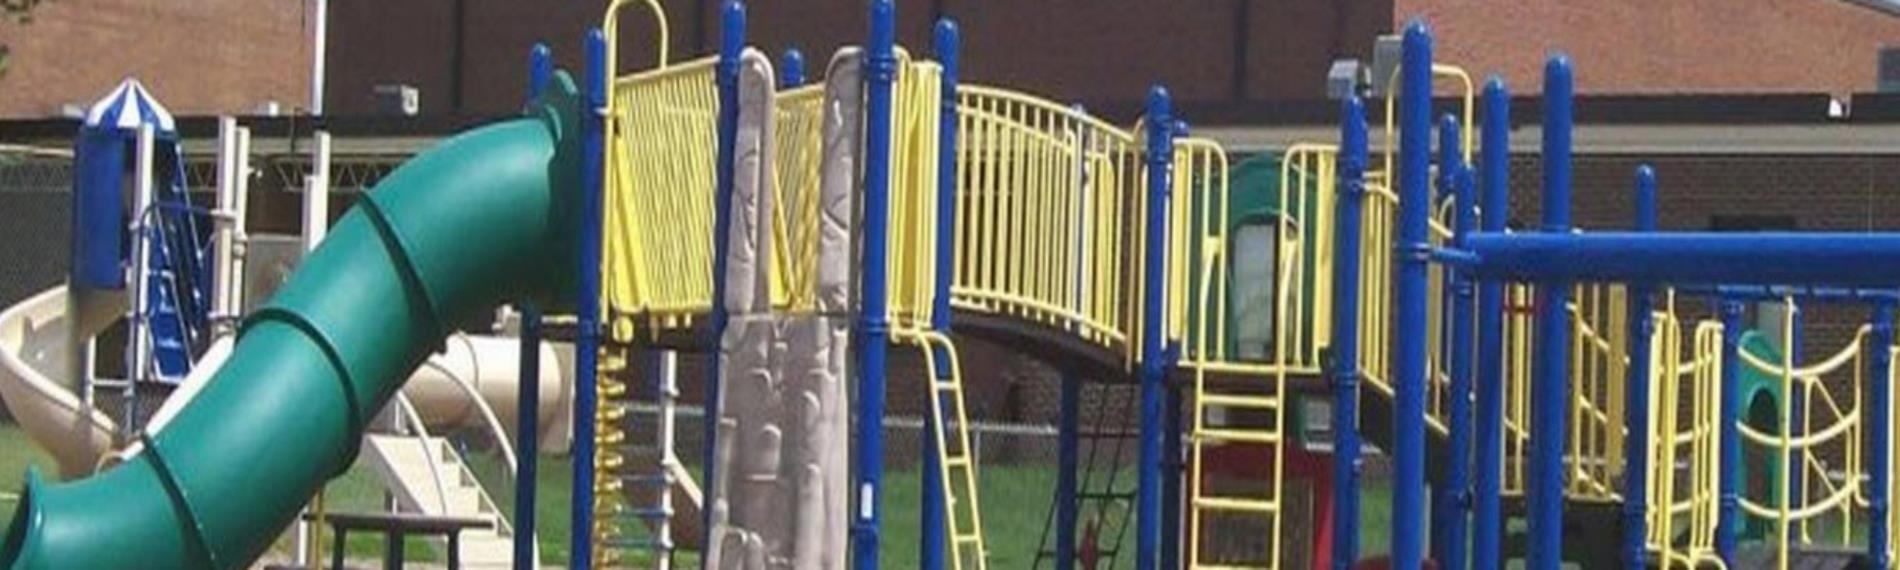 Verndale playground